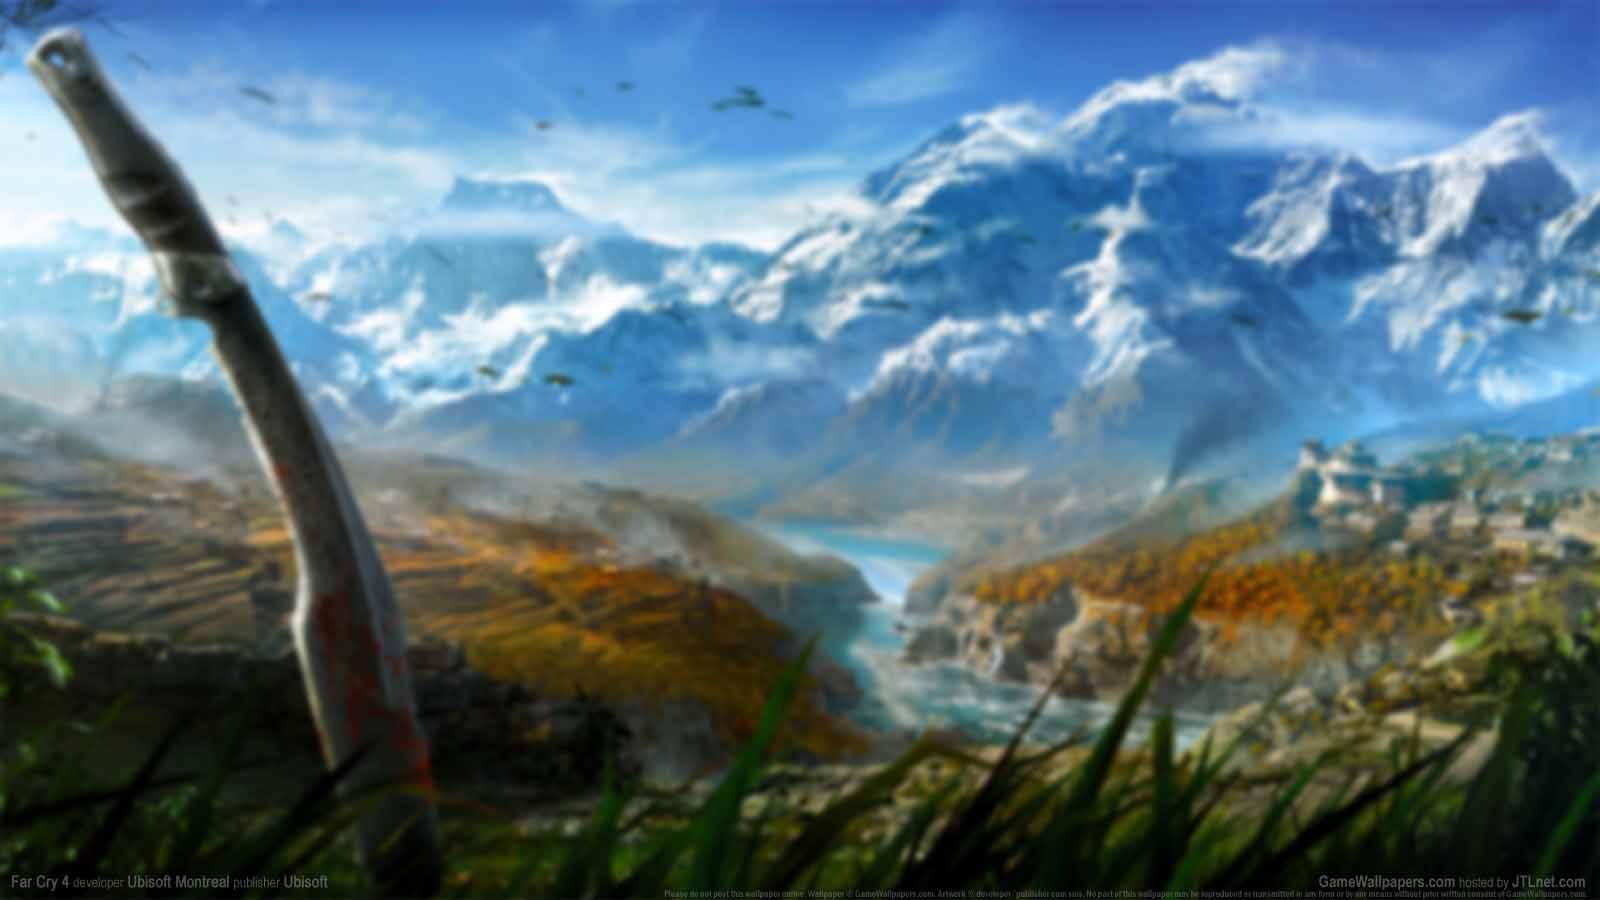 Far cry 4 wallpaper wallpapersafari - Far cry 4 wallpaper ...